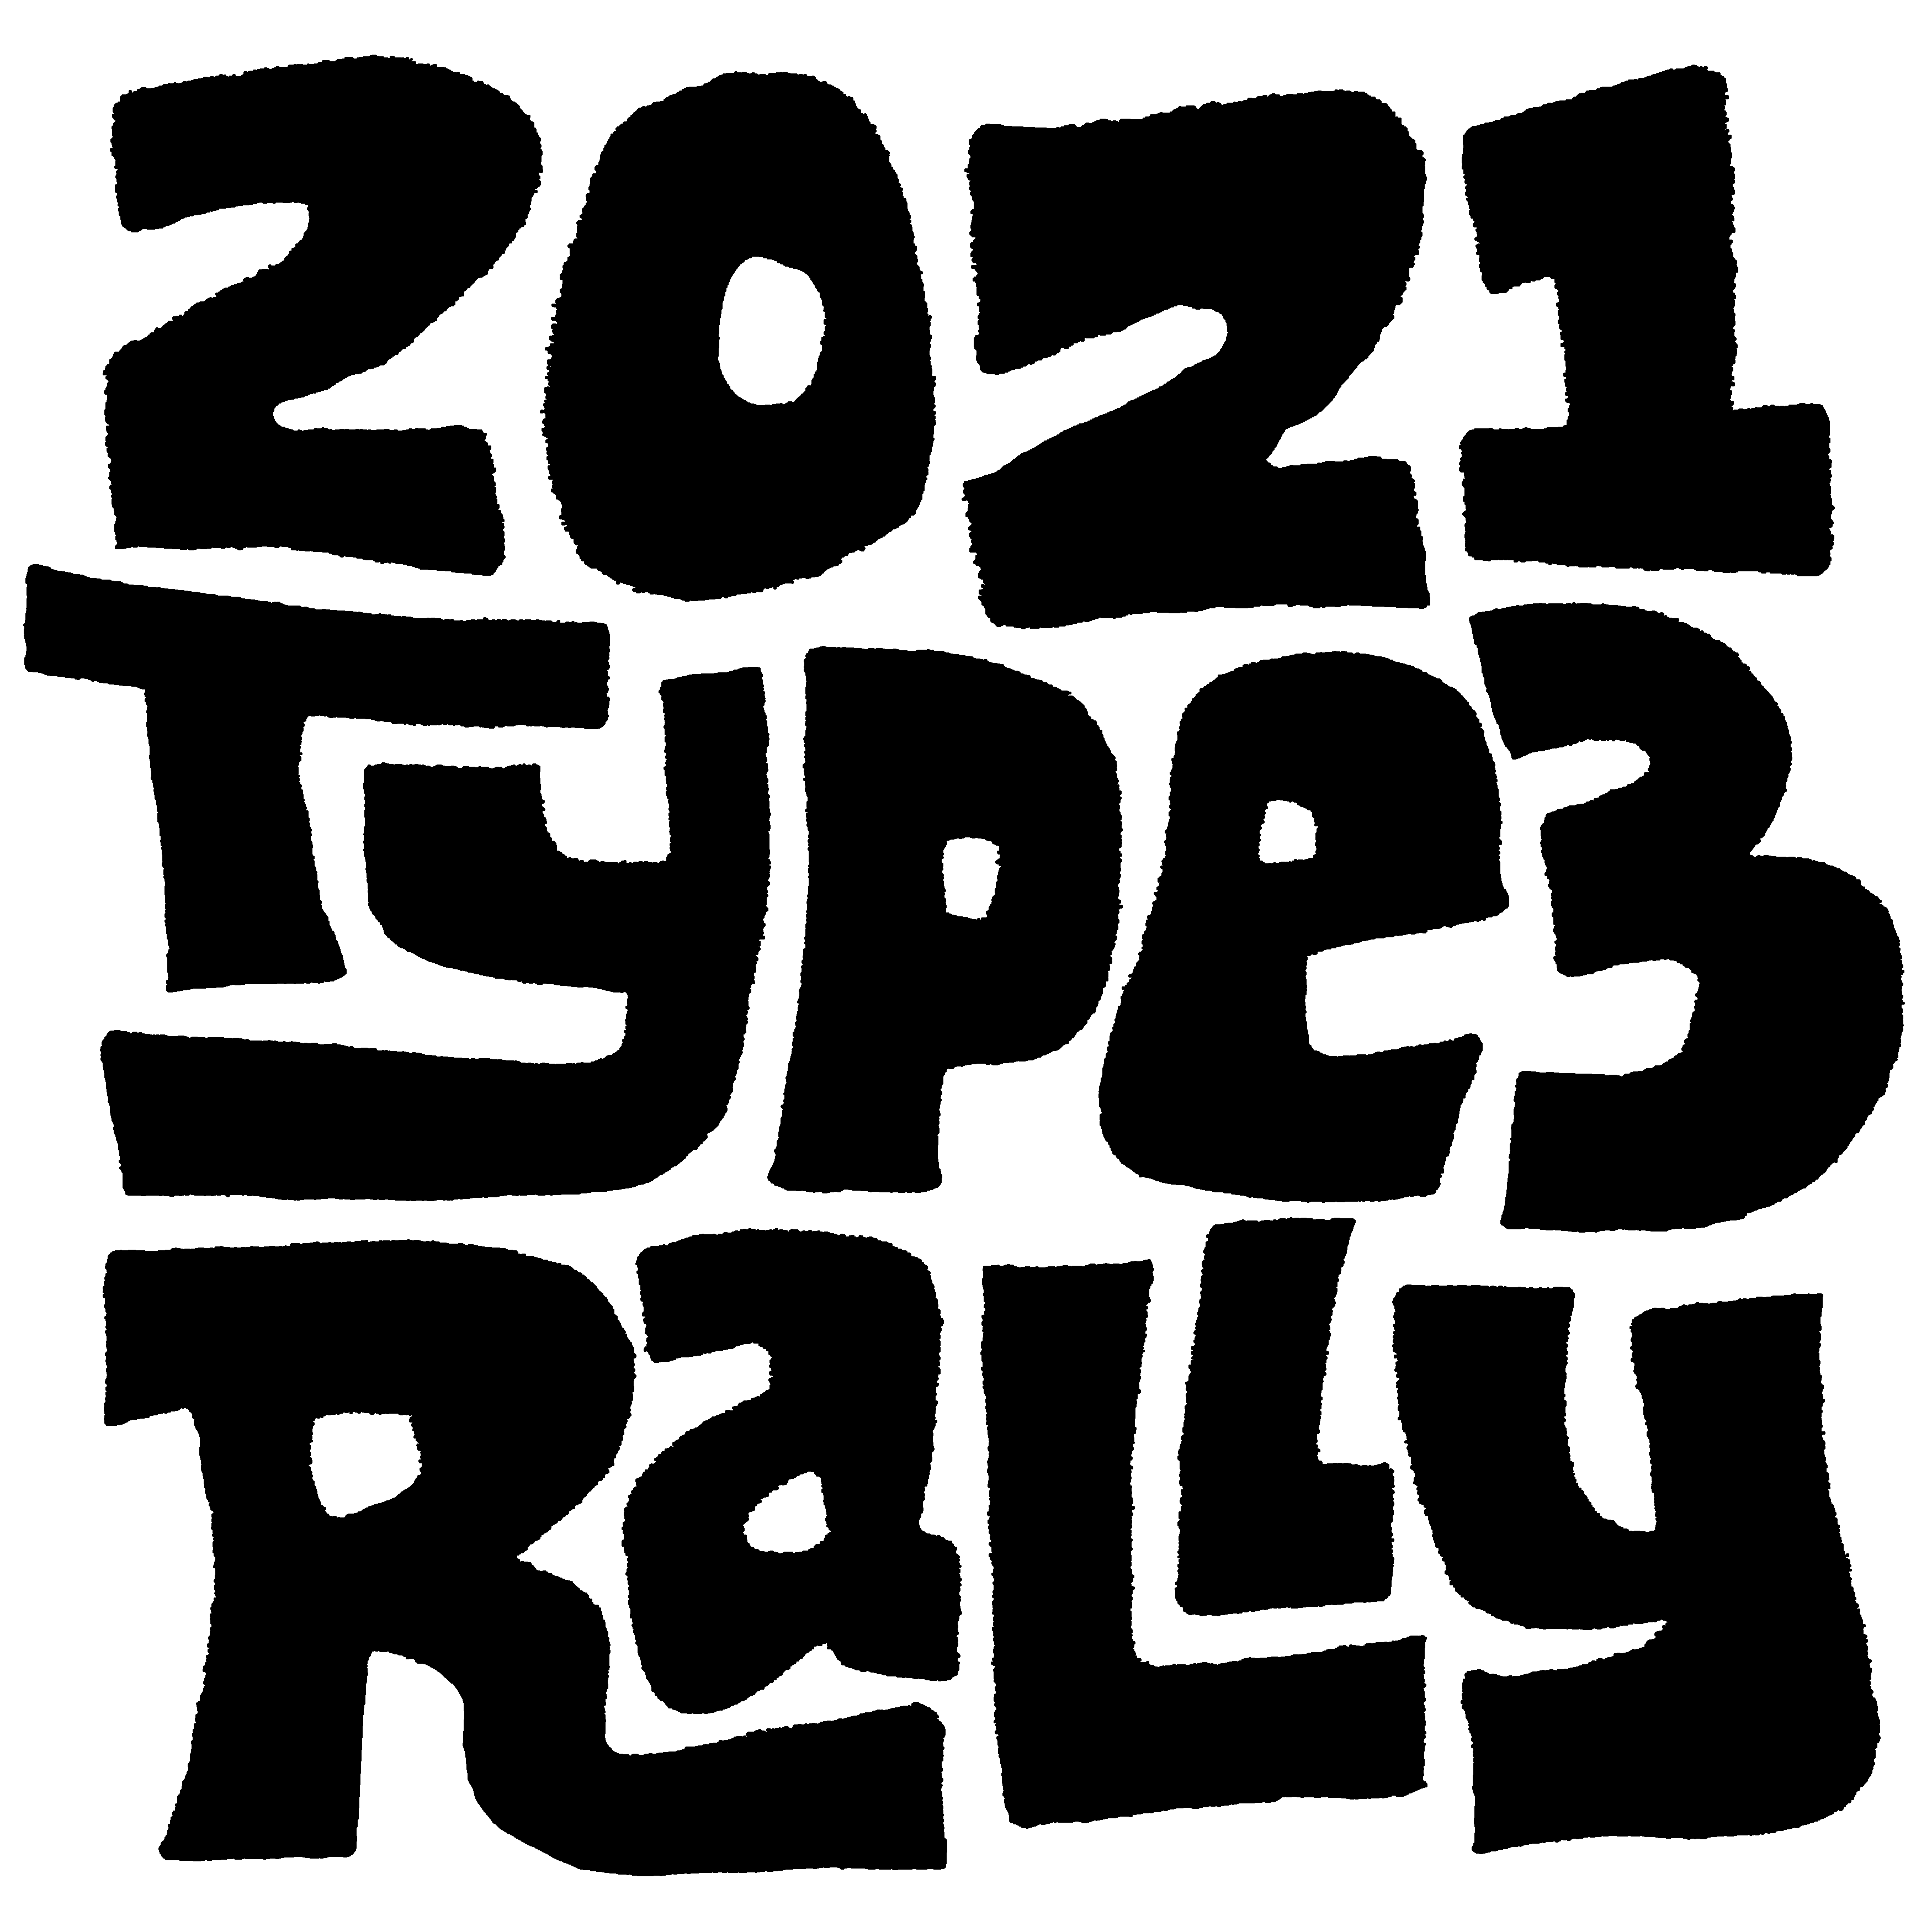 type3rallylogo-black.png